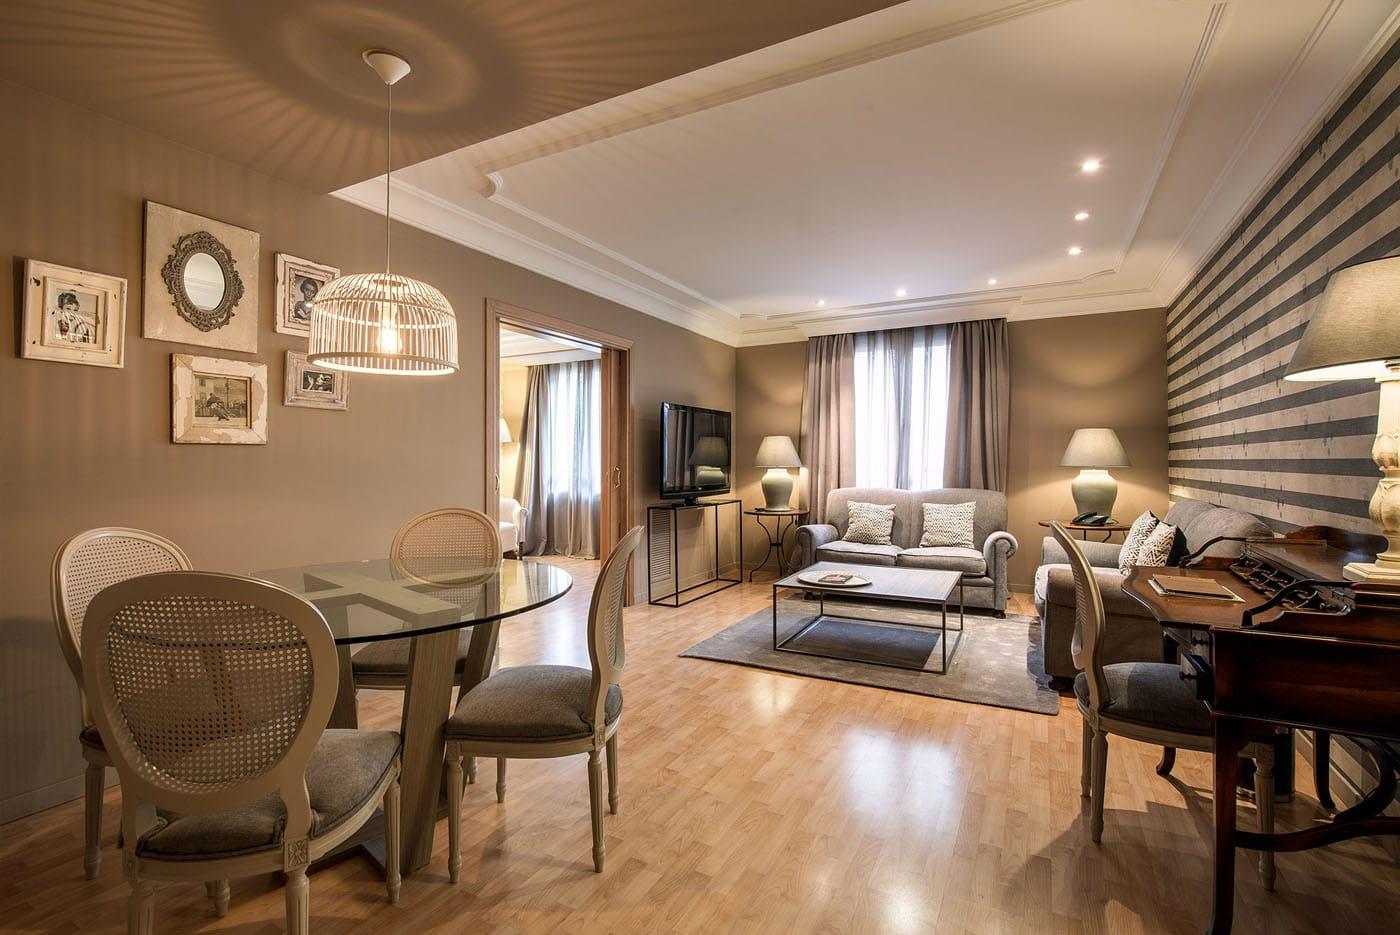 hotel-vincci-lys-adolfo-gosalvez-hoteles-panoramicos